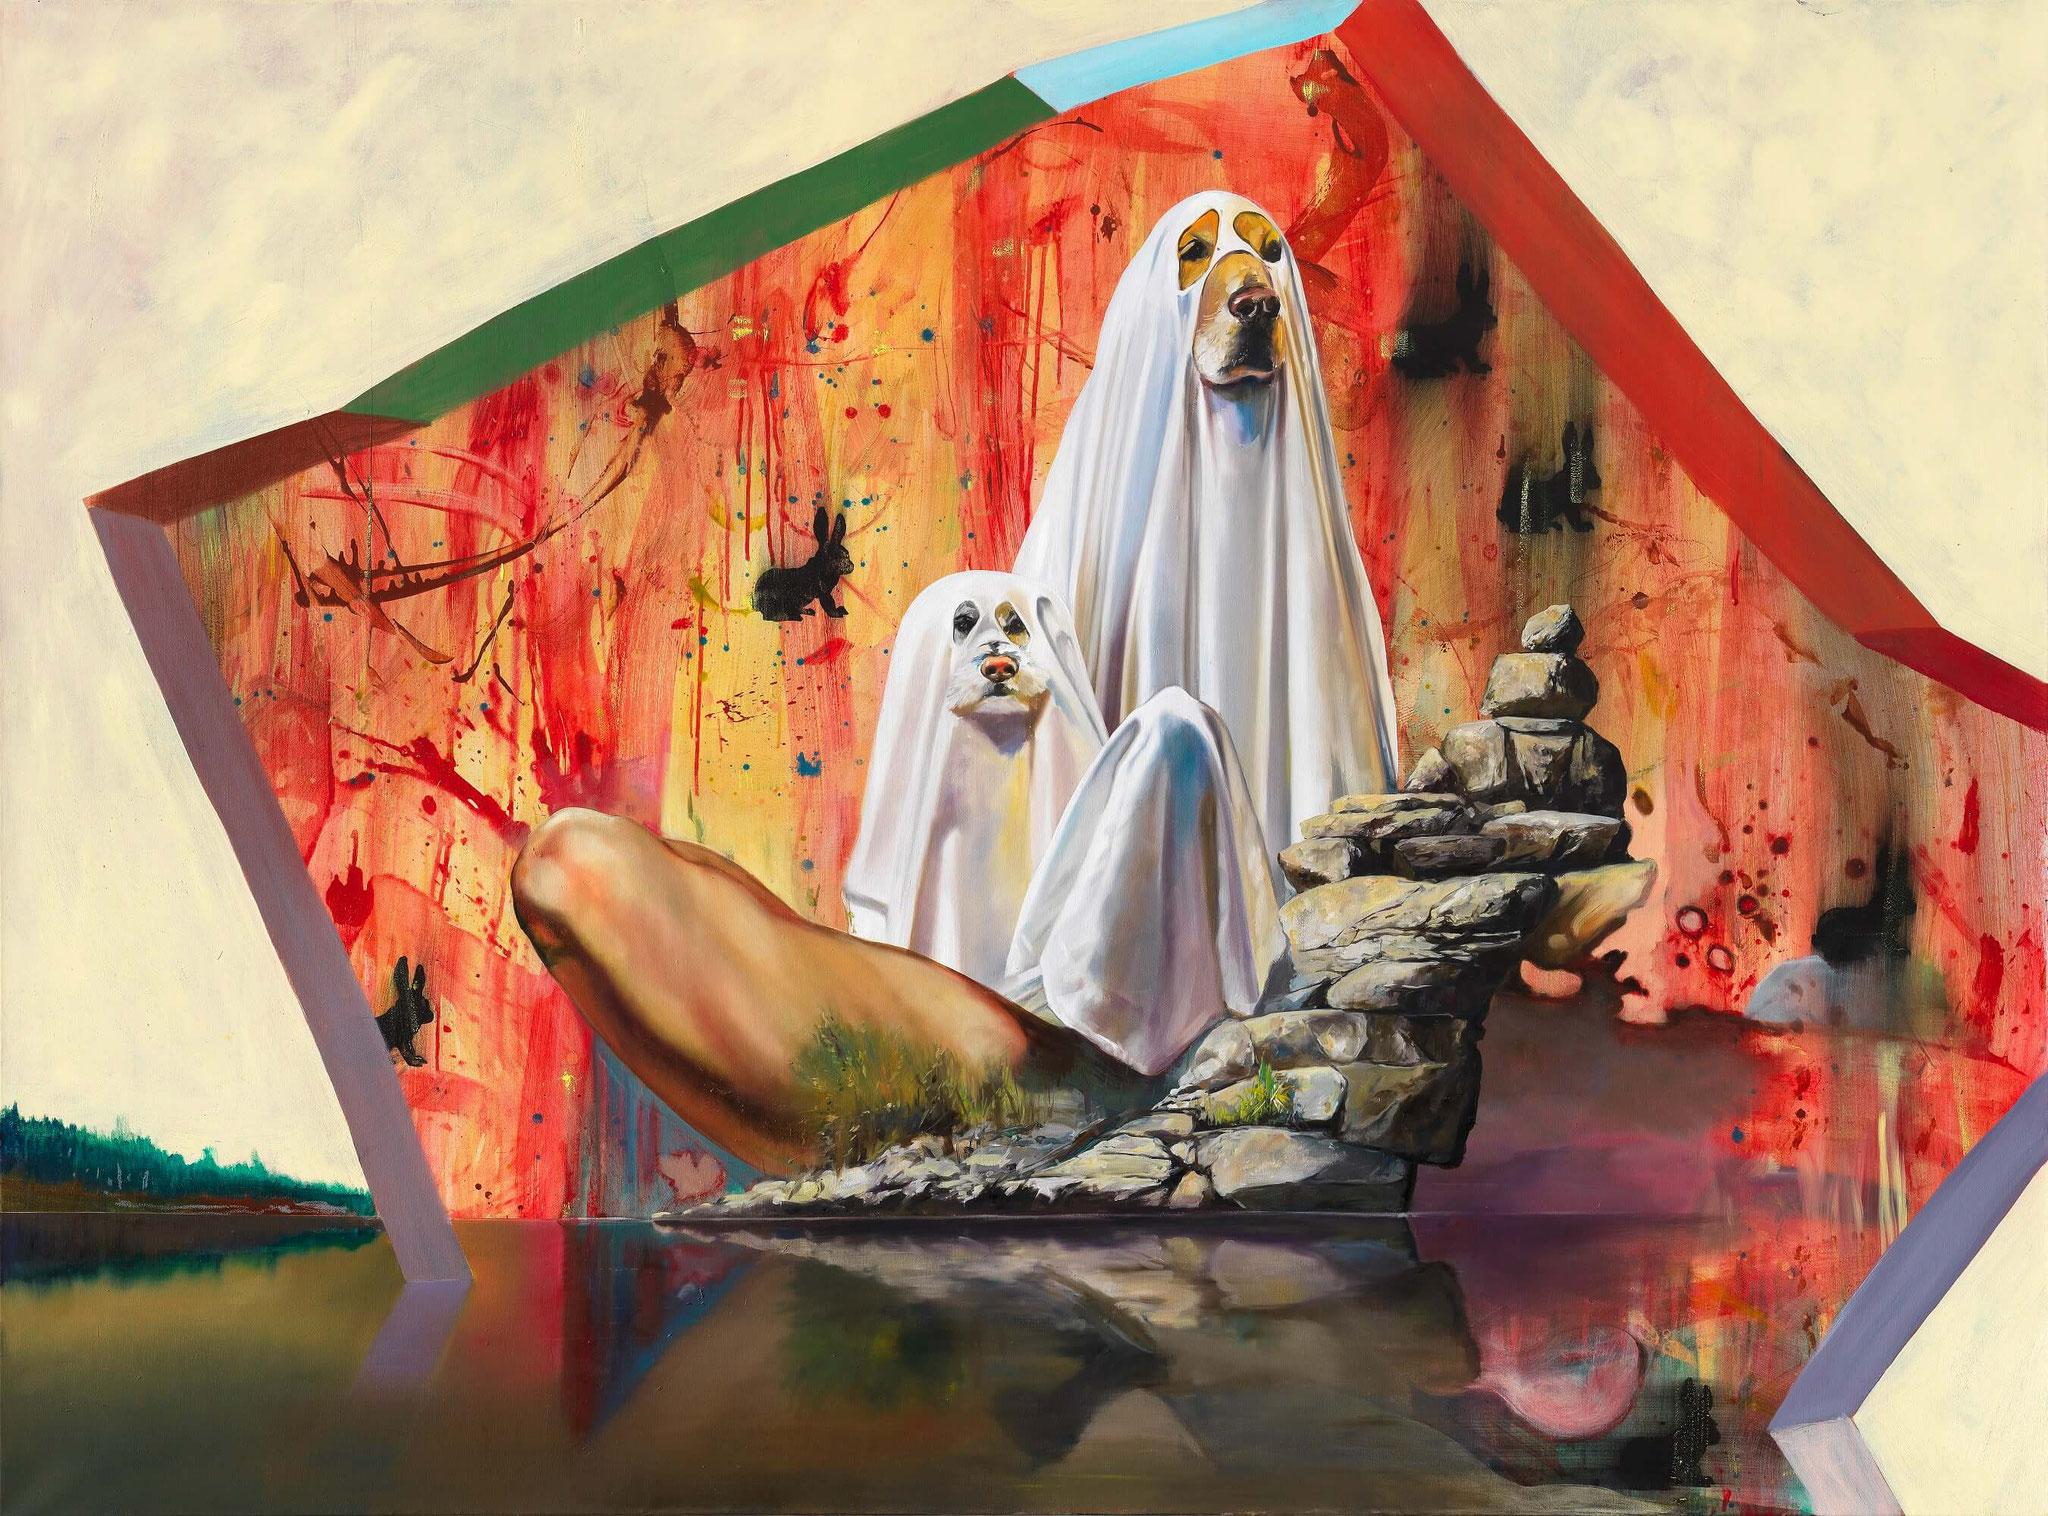 Böhme / Maderthaner / Kodritsch, Doglooksklan, Mischtechnik auf Leinwand, 170 x 230 cm, 2016